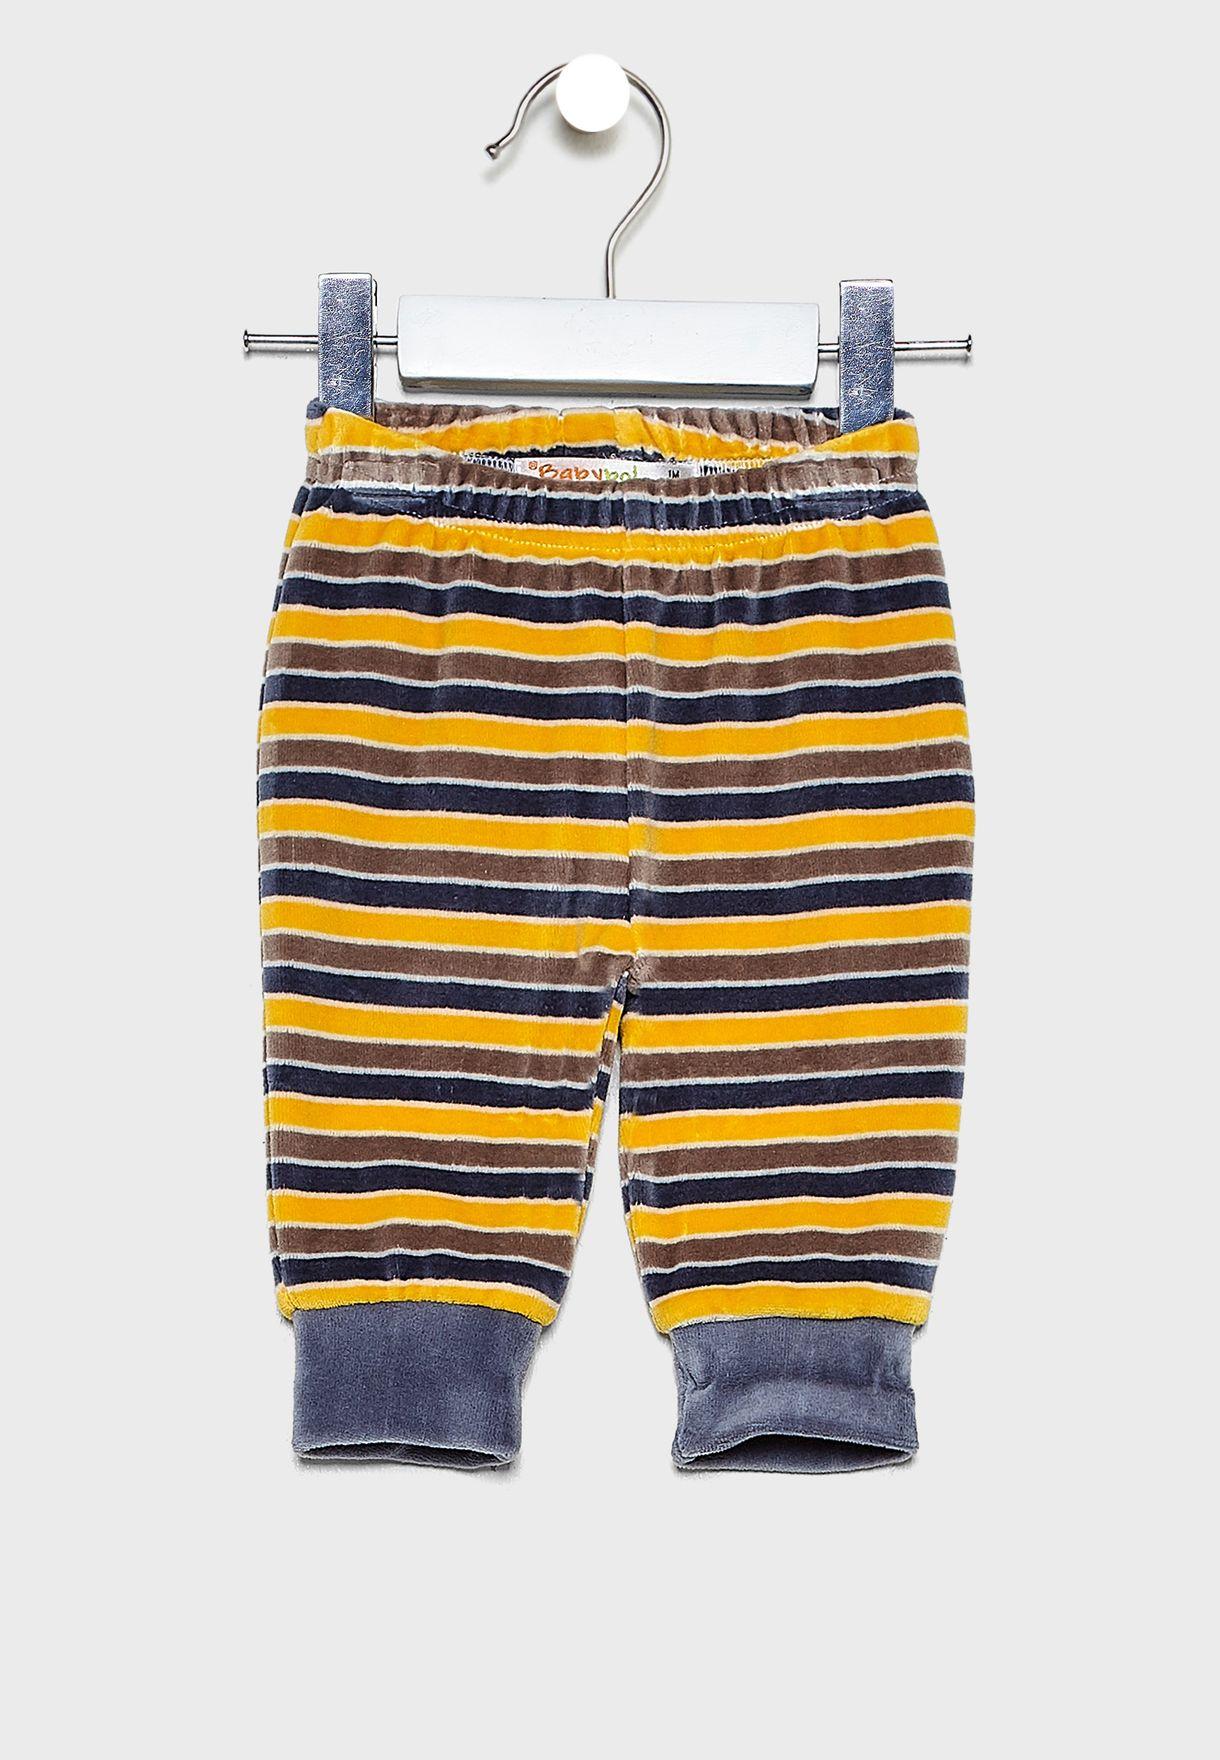 Infant 3 Piece Striped Gift Set